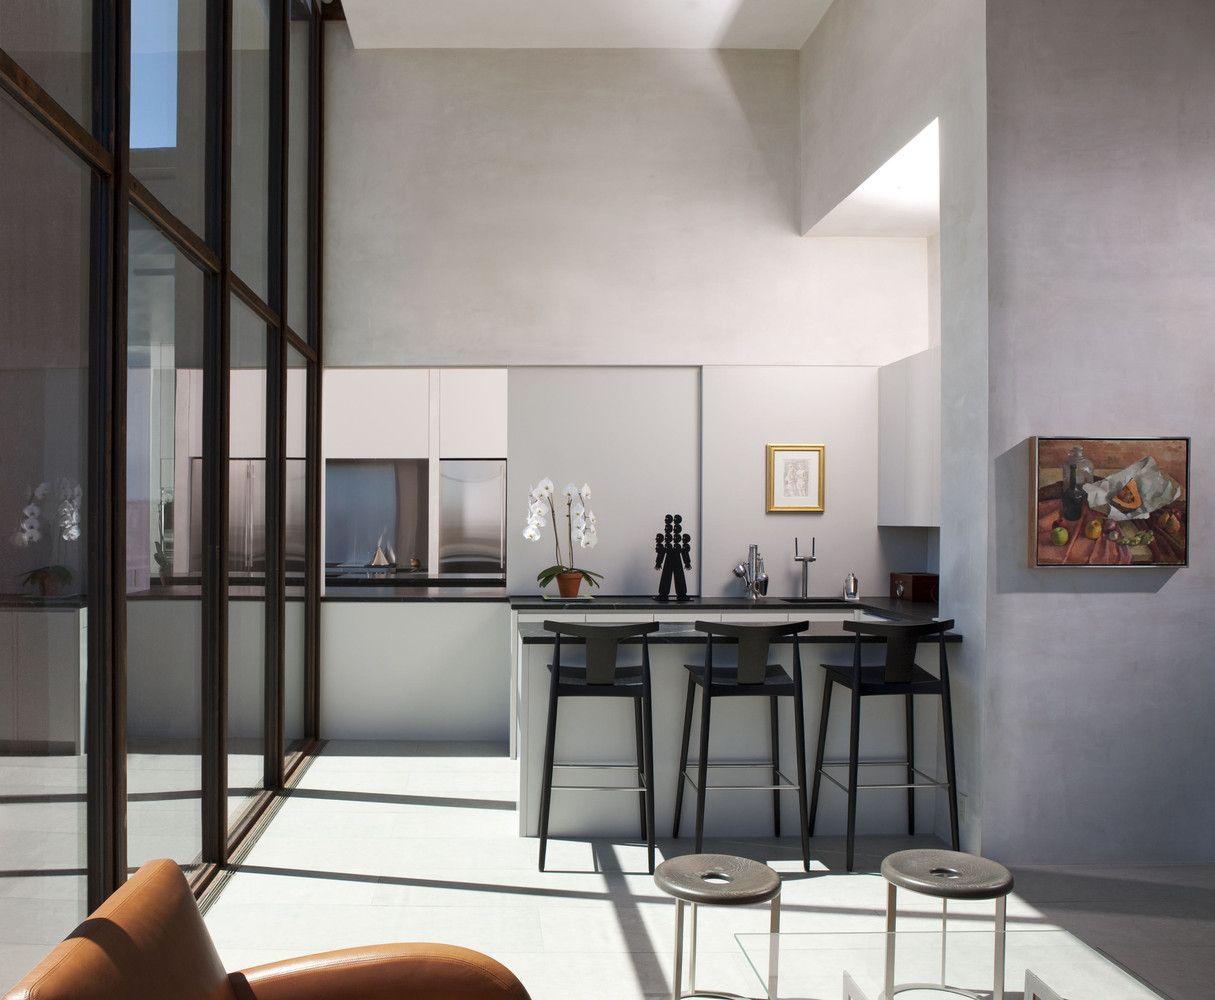 Galería de Casa Valle Escondido / Bucchieri Architects - 10